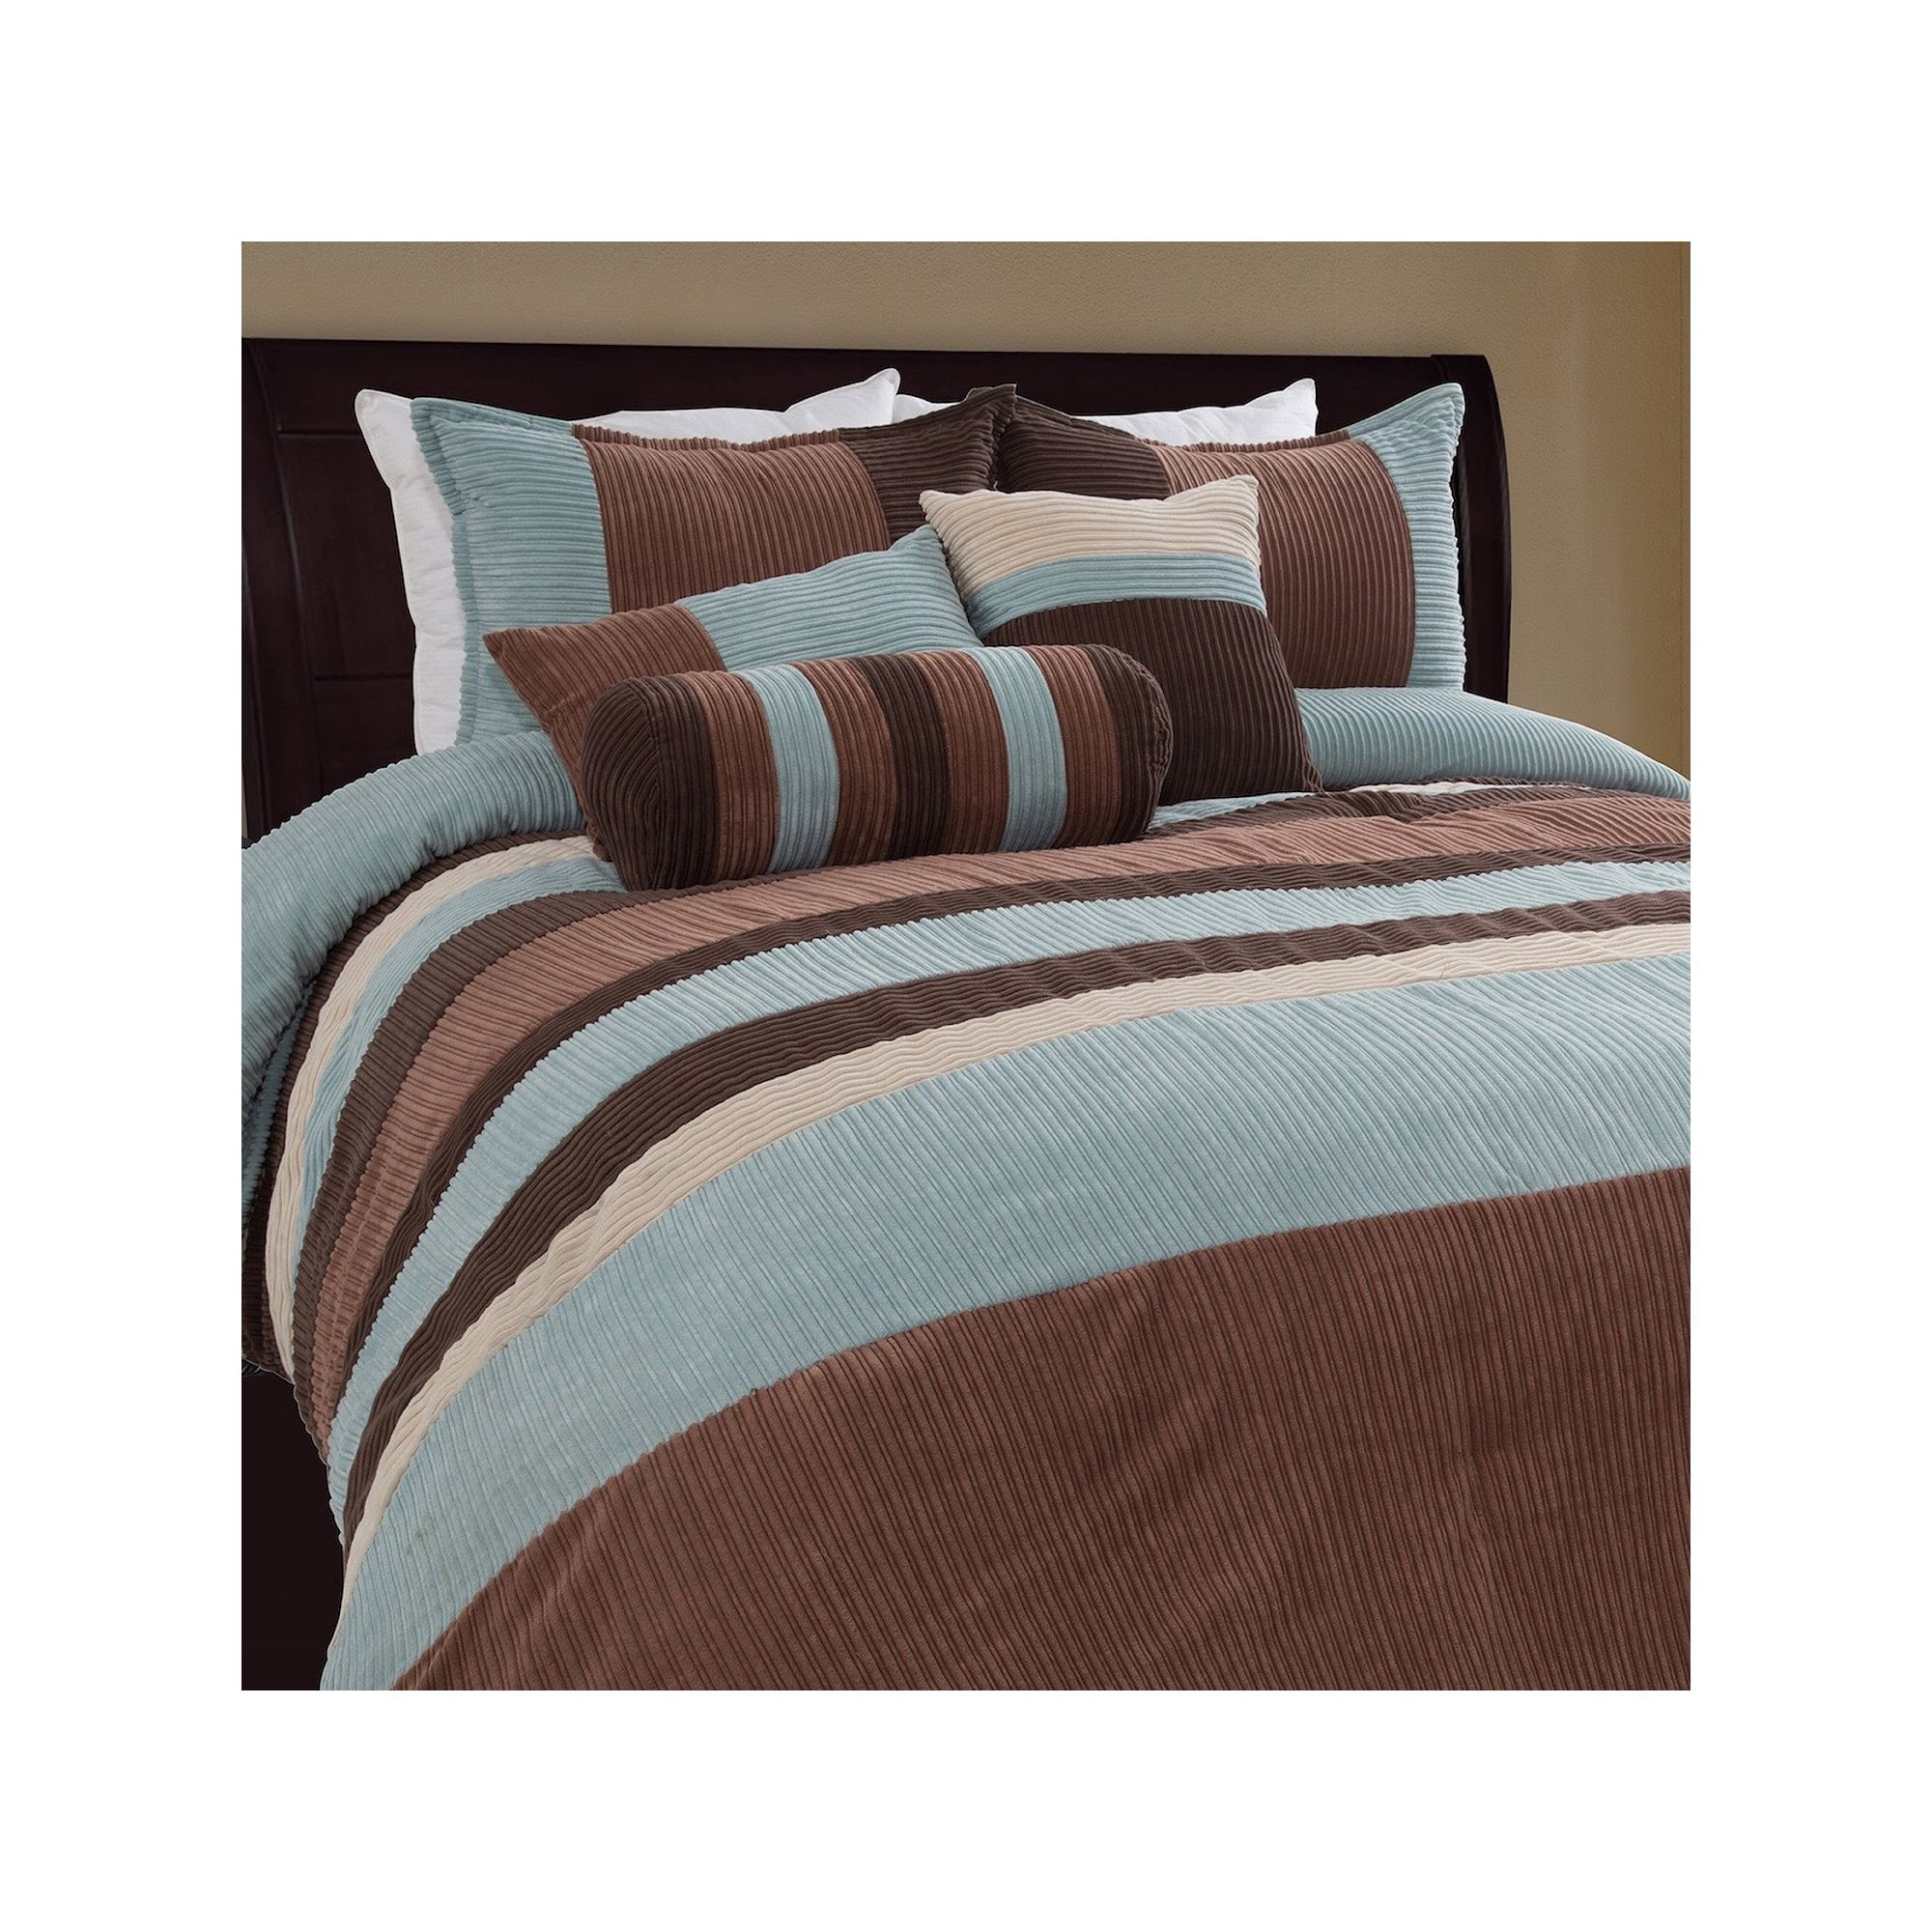 Geometric Bed Set Comforter sets, Bed linens luxury